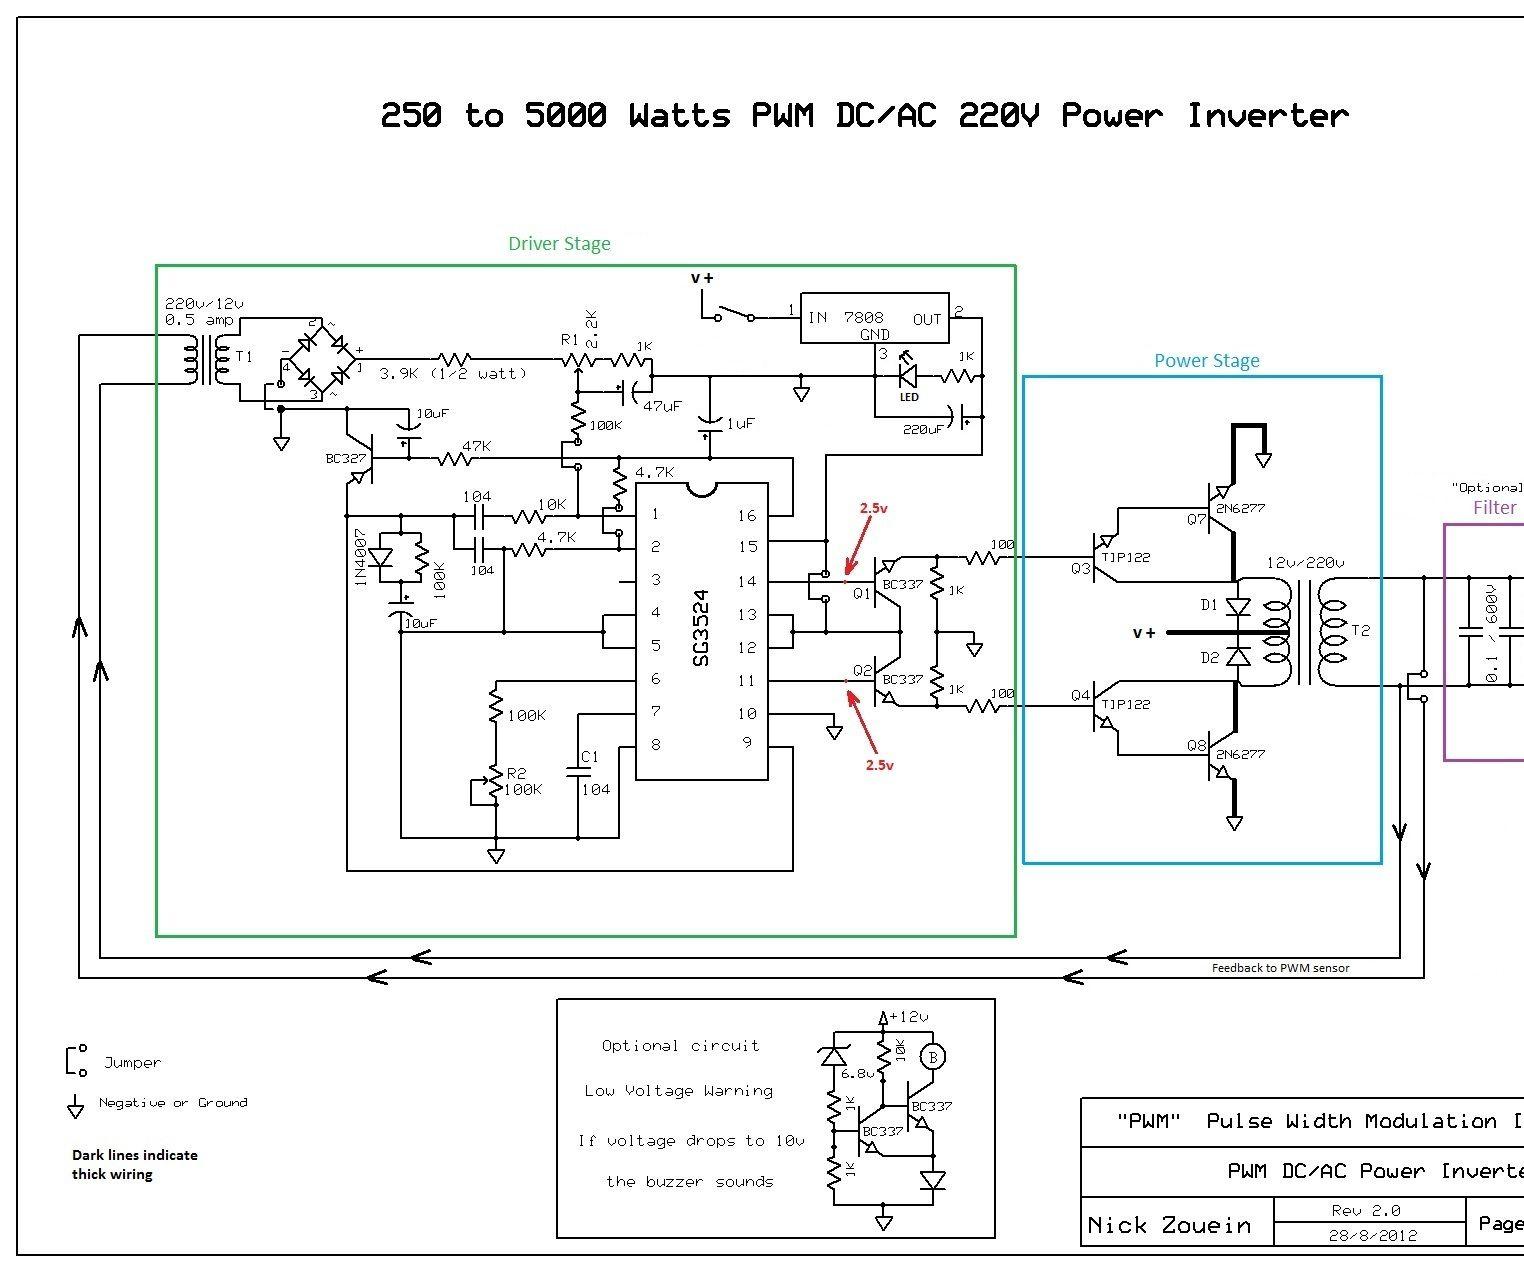 motor wiring diagram 50hz wiring diagram source Water Heater Wiring Diagram 220V